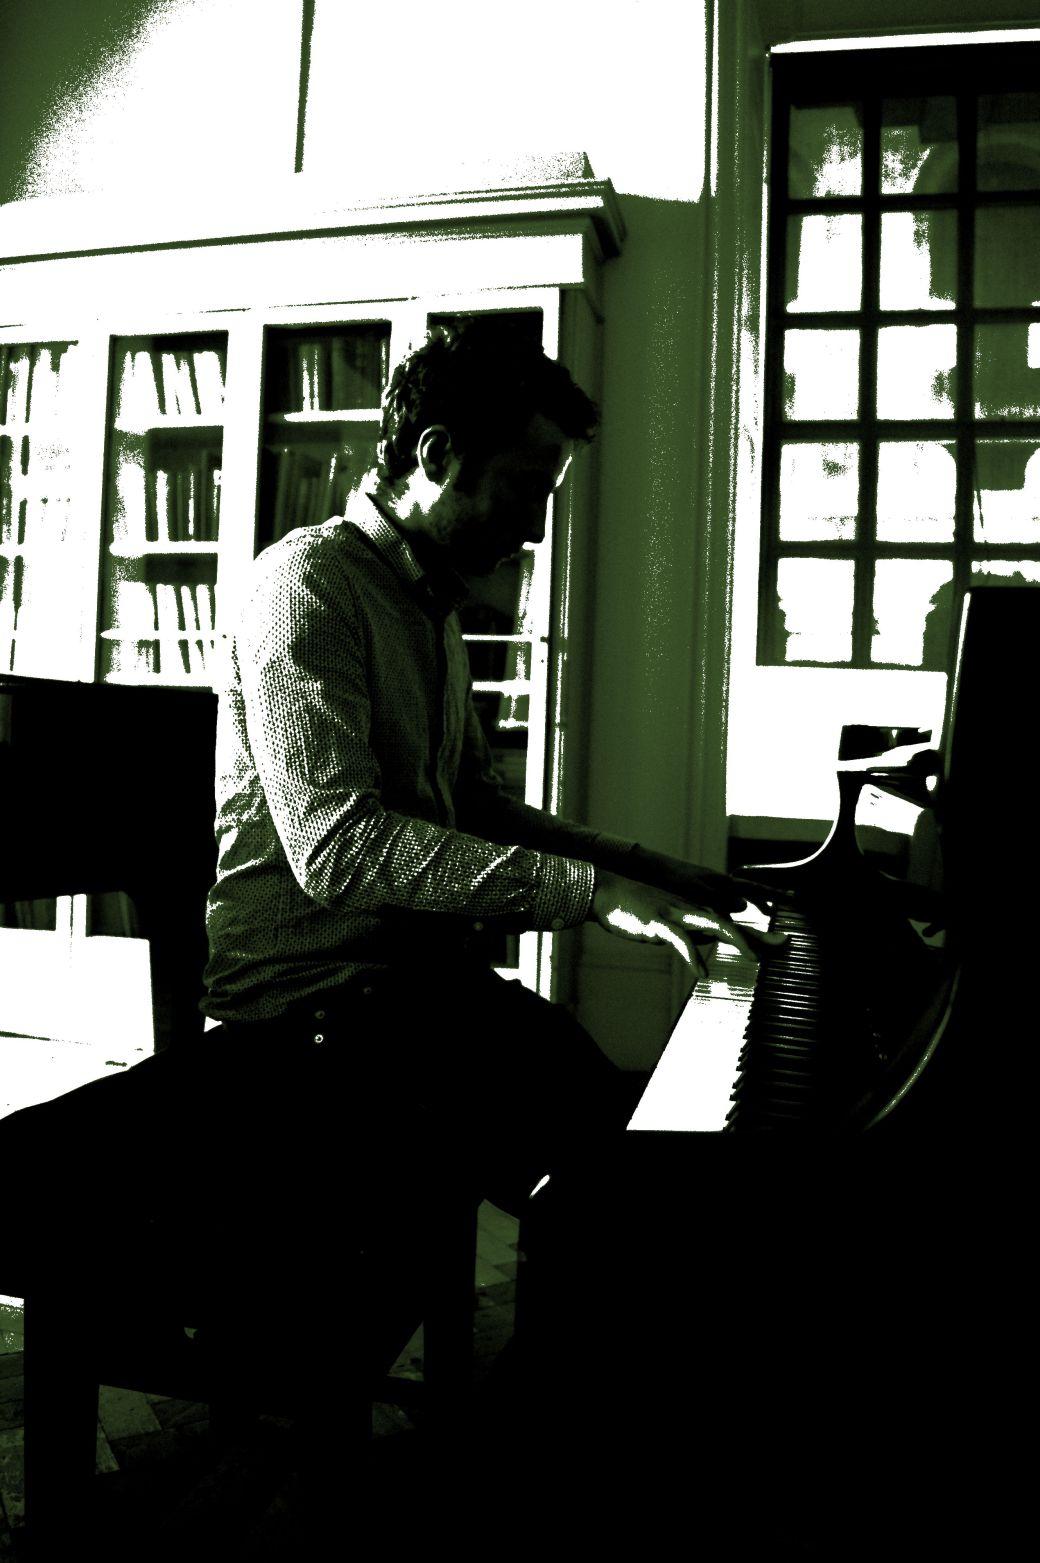 ben playing 2 edited (artsy